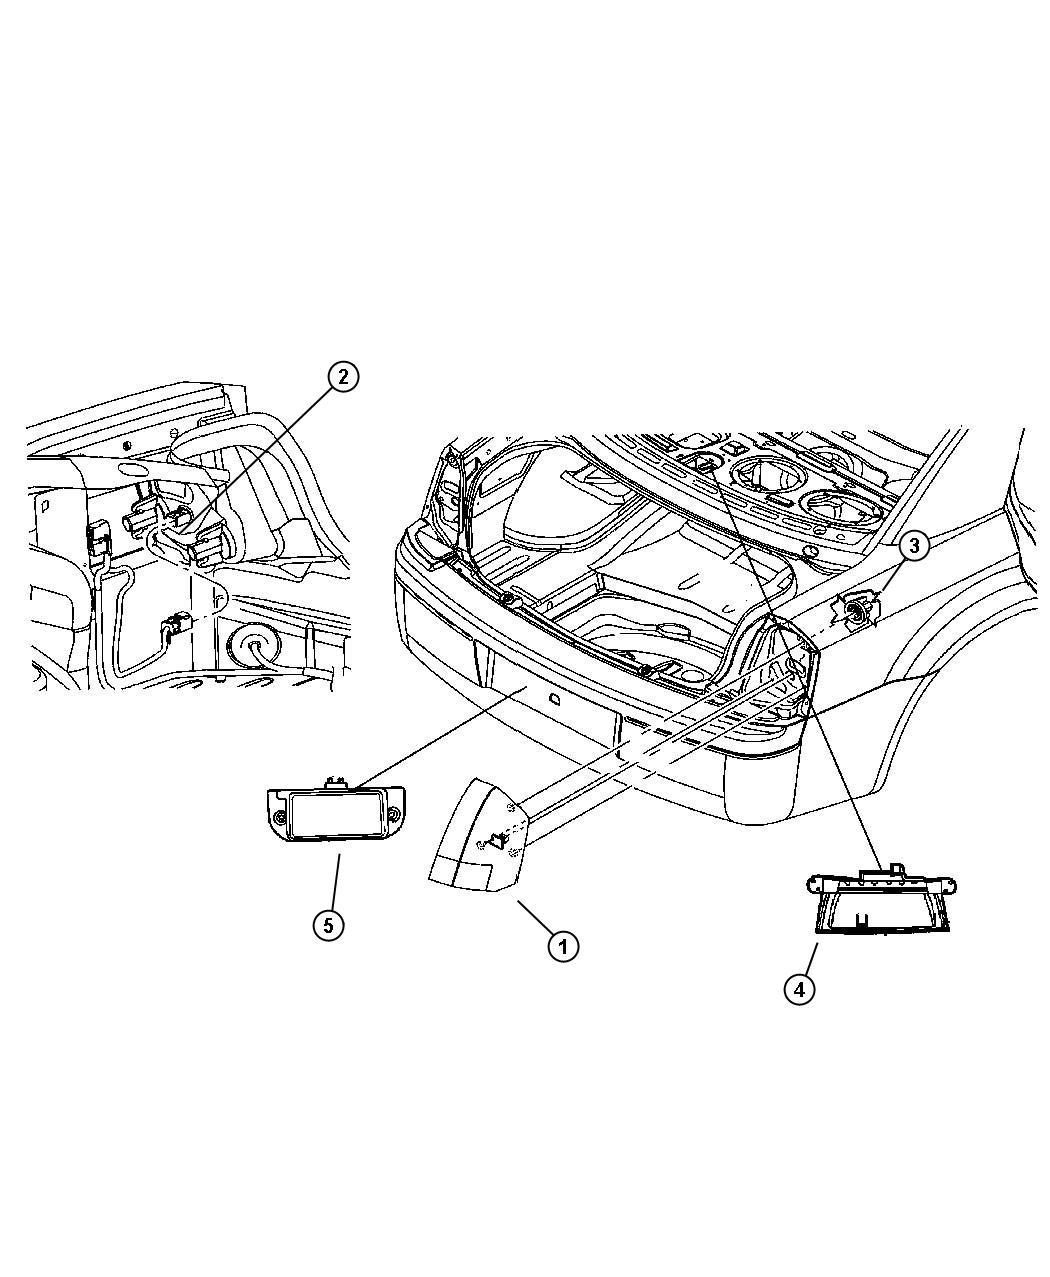 2007 Dodge Magnum SRT8 SRT8 6.1L Hemi SRT V8 Lamp. Licence